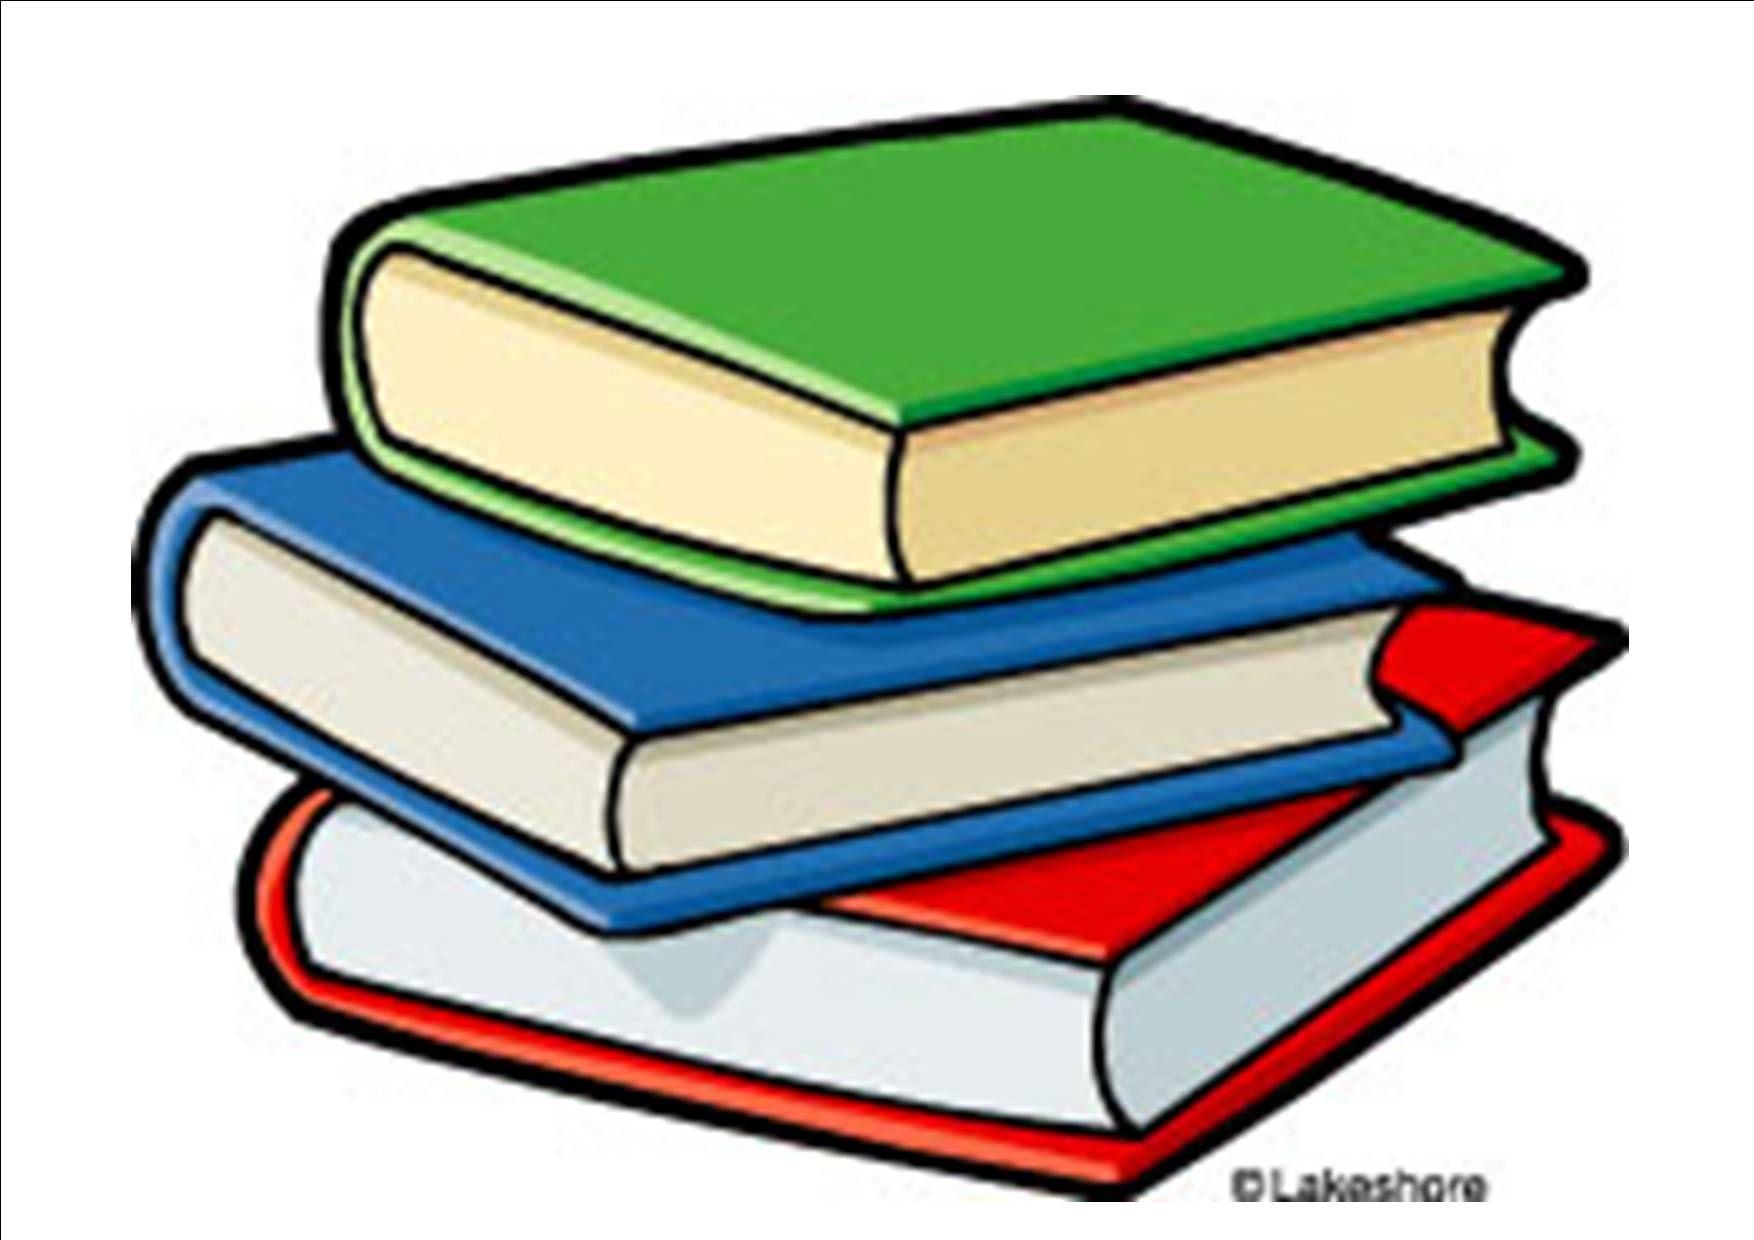 Teacher Books Clipart.